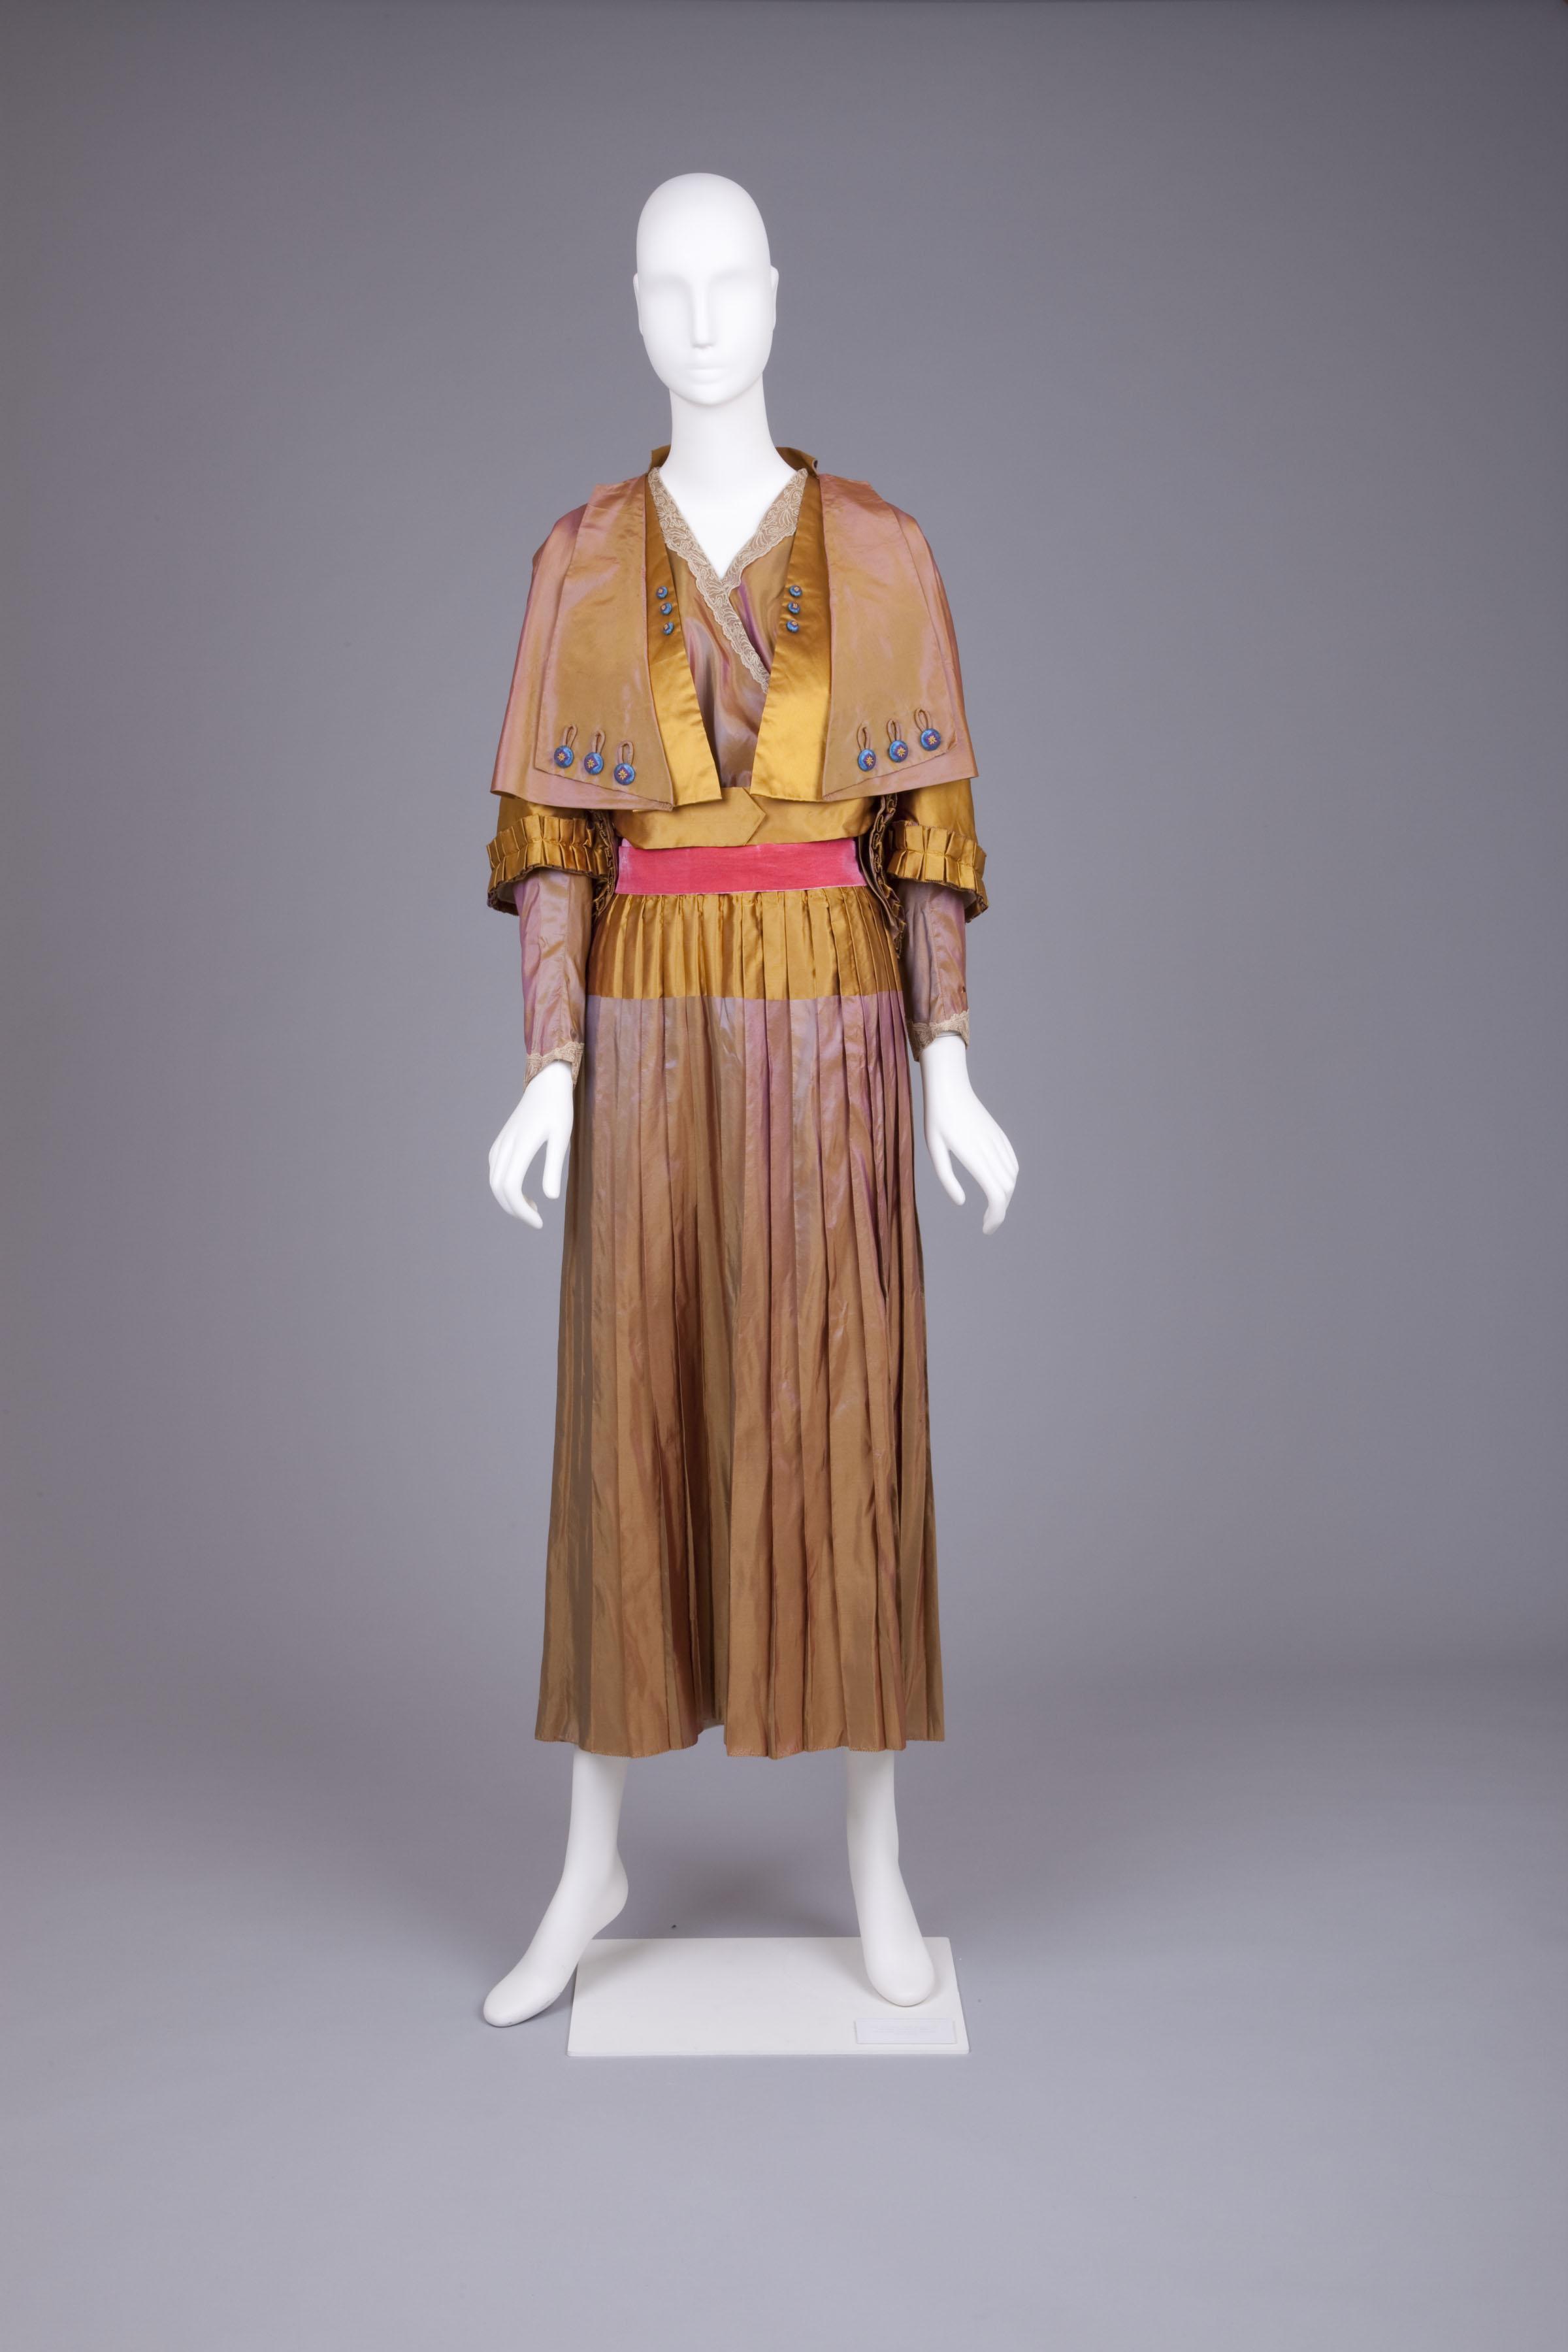 Dress, mid-1910s, 'Landum Minneapolis', silk taffeta, Goldstein Museum of Design, 2006.043.006a-c